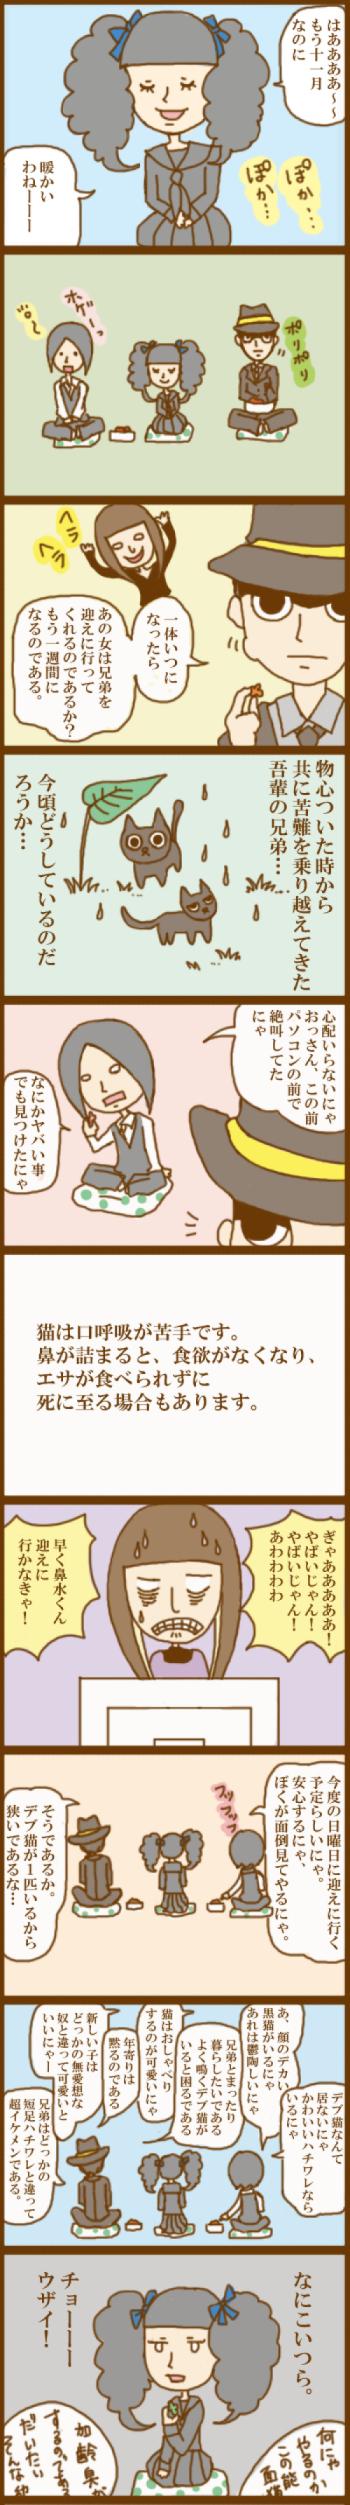 f:id:suzuokayu:20201101162008j:plain